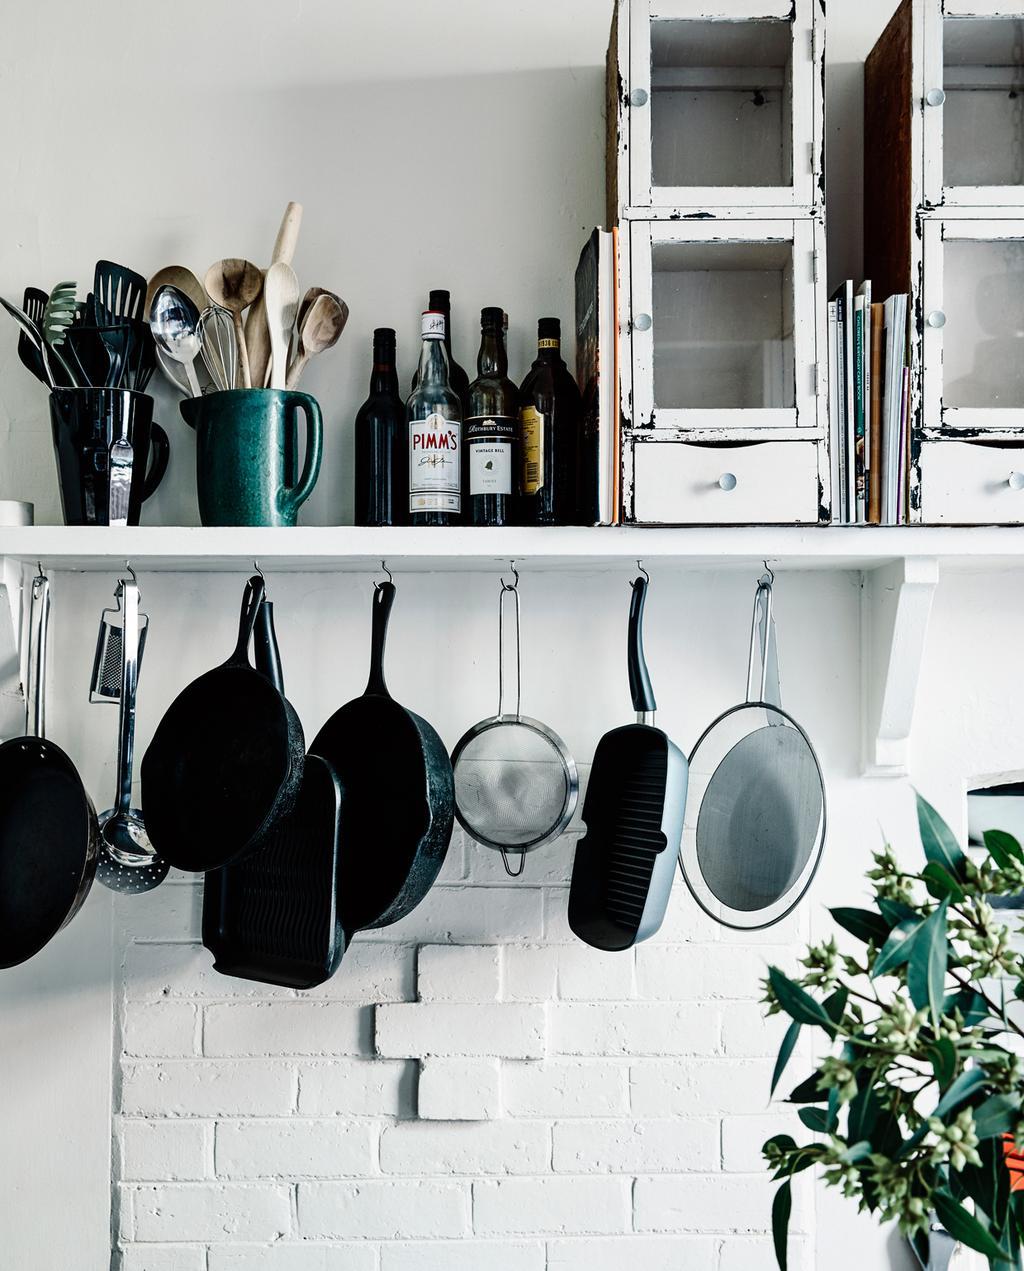 vtwonen 2-2020 | keukengerei